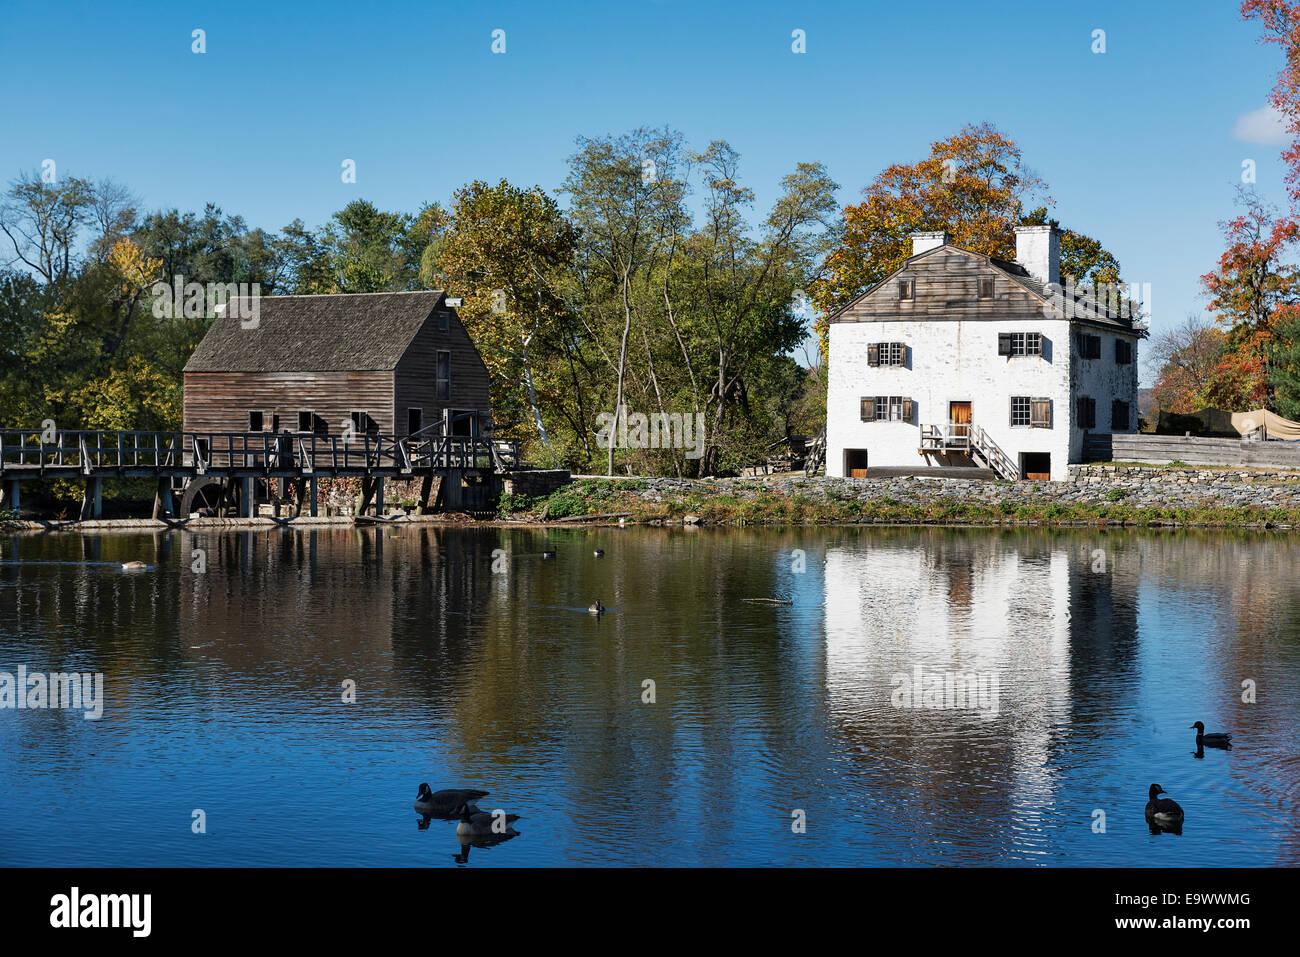 Historic Philipsburg Manor, Sleepy Hollow, New York, USA - Stock Image